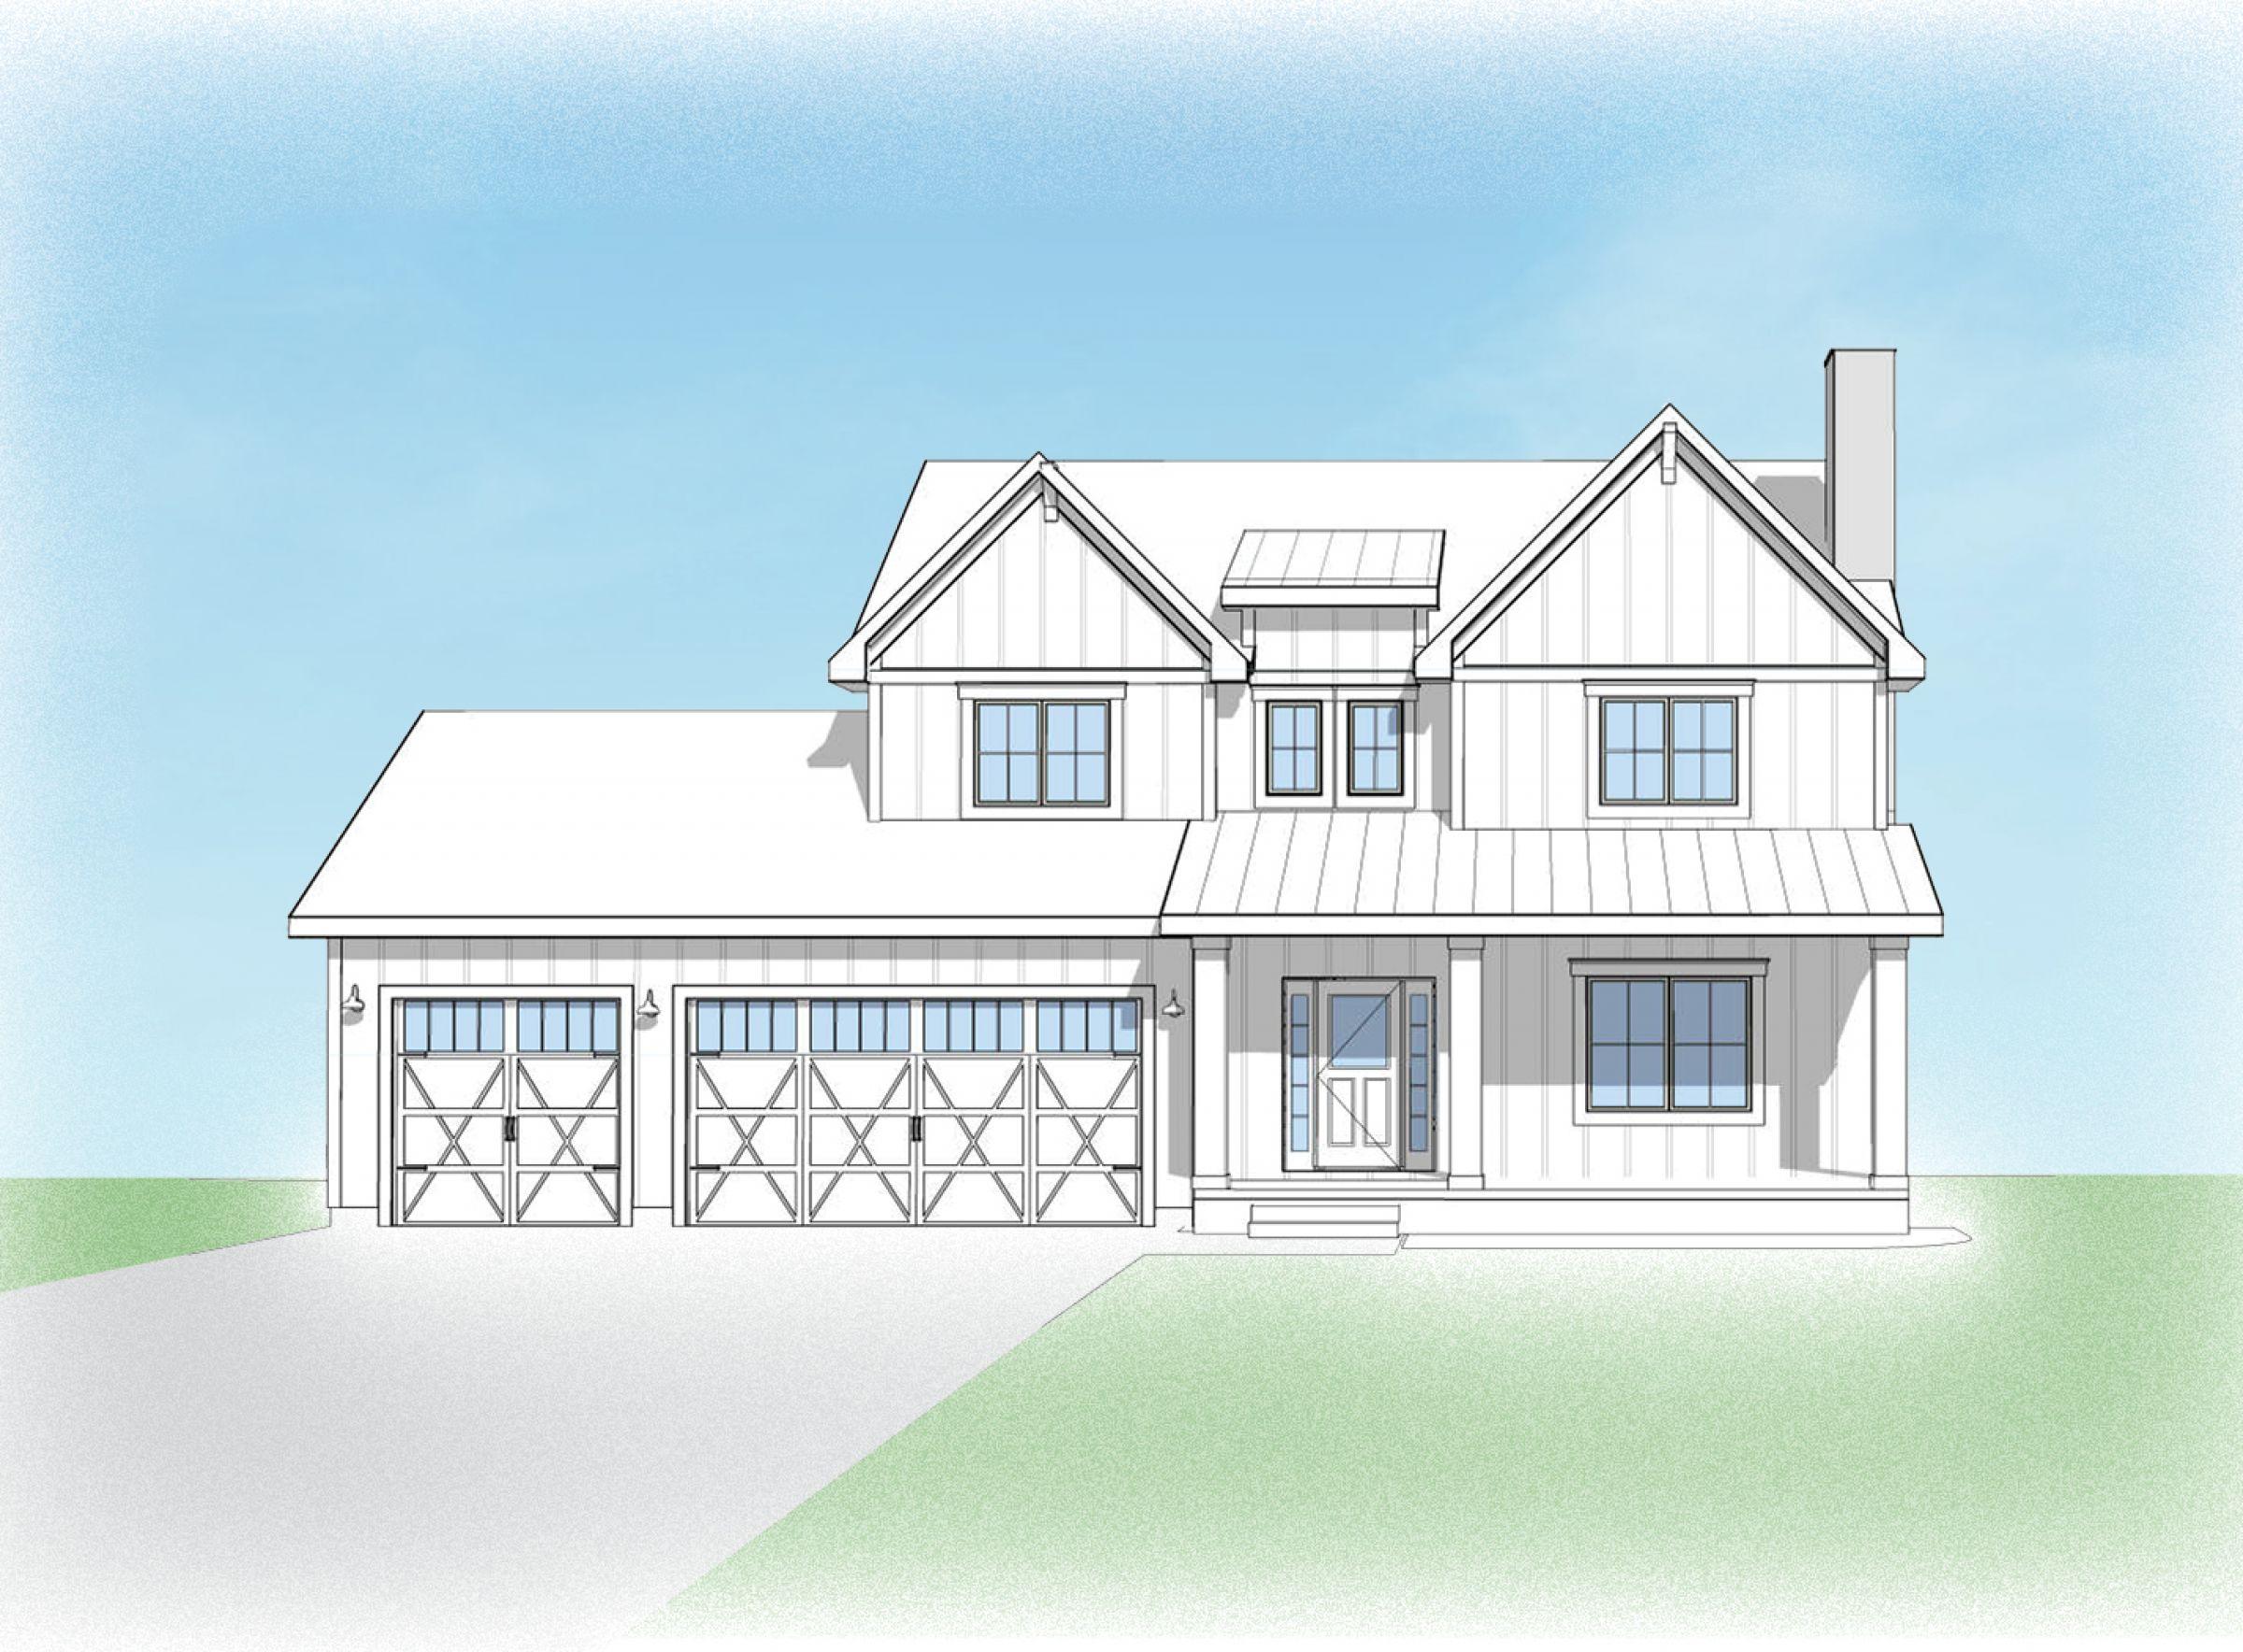 residential-warren-county-iowa-1-acres-listing-number-15672-2-2021-08-05-224732.jpg